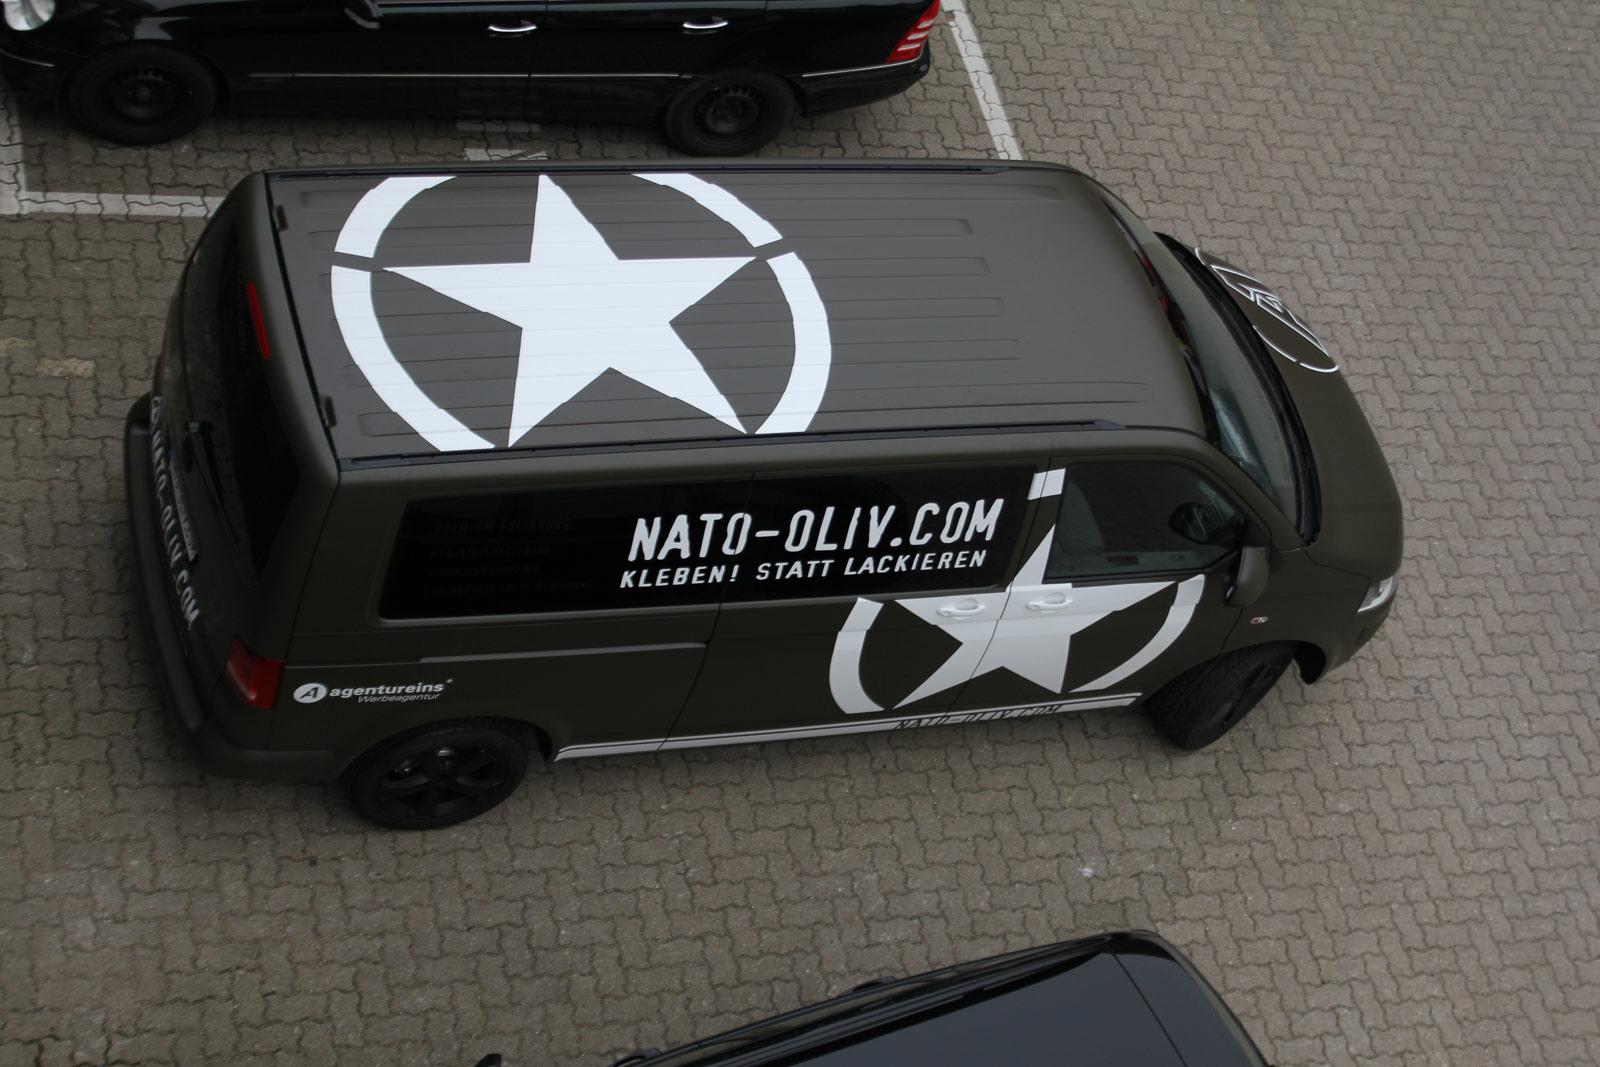 VW_T5_VOLLFOLIERUNG_NATO-OLIV_13